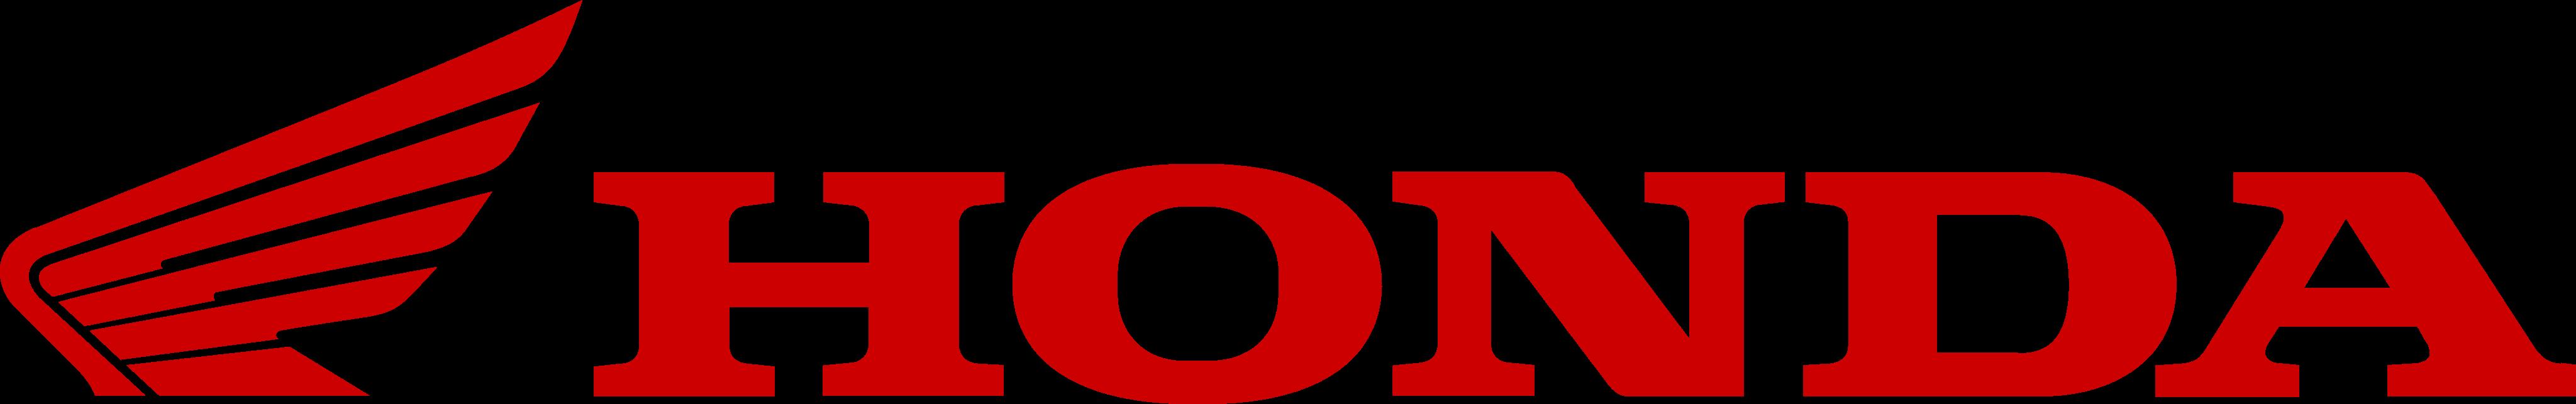 honda motos logo 1 - Honda Motorcycles Logo